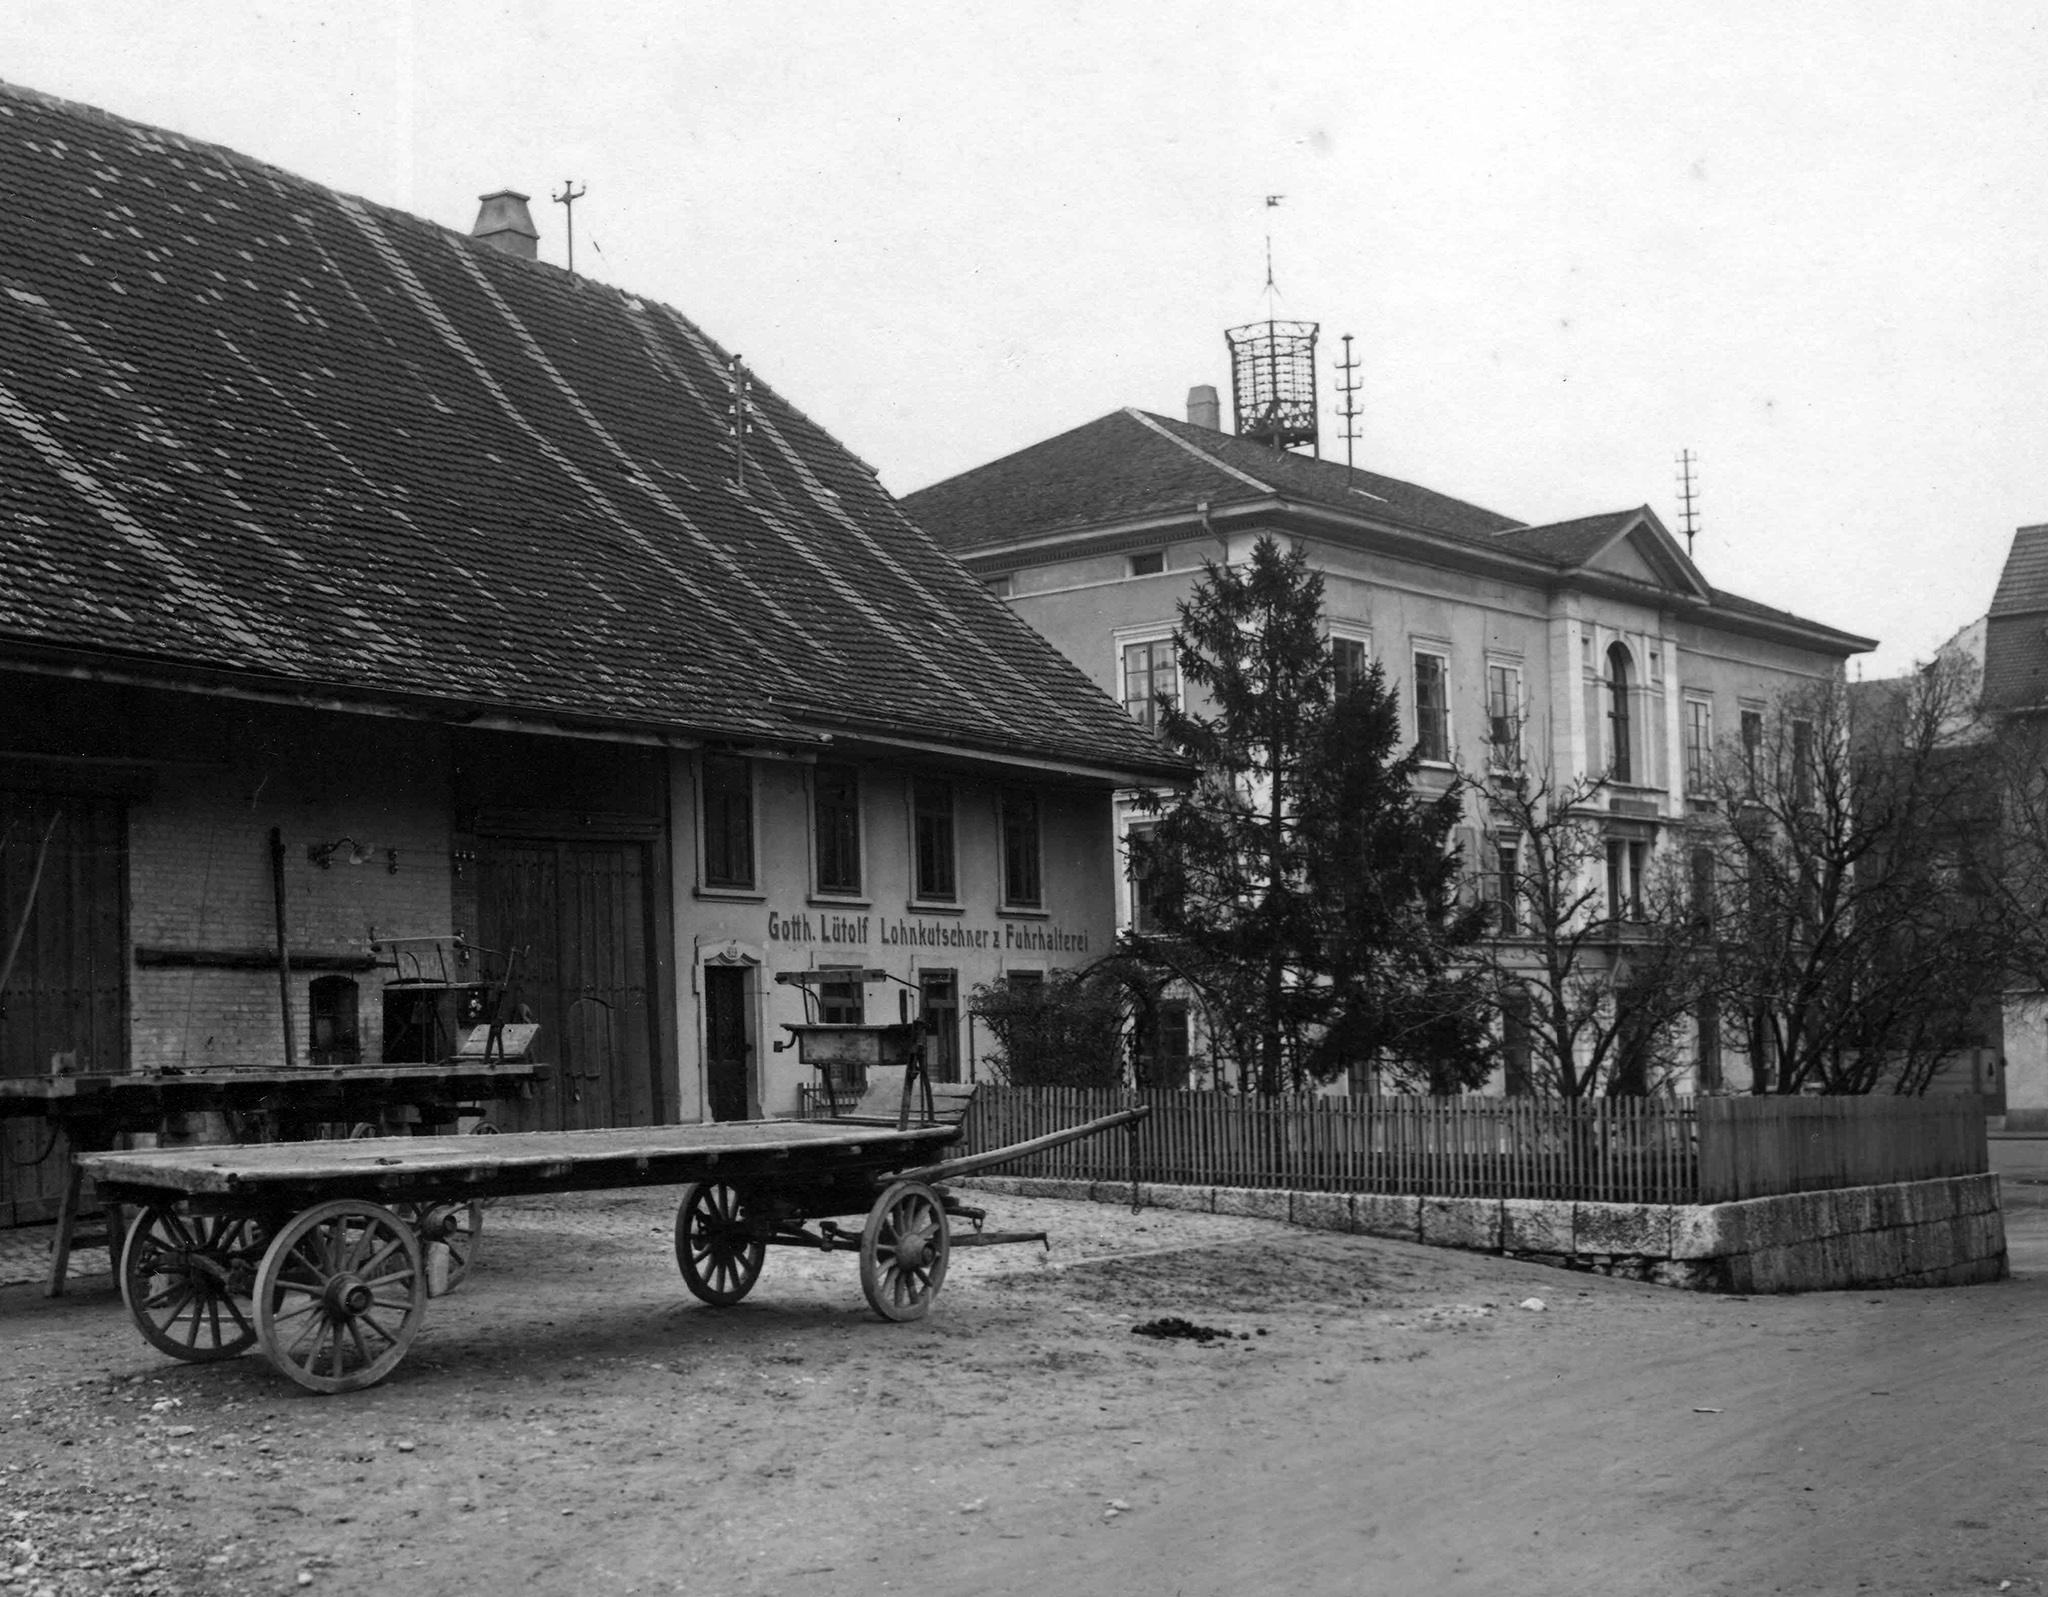 Olten Konradstrasse